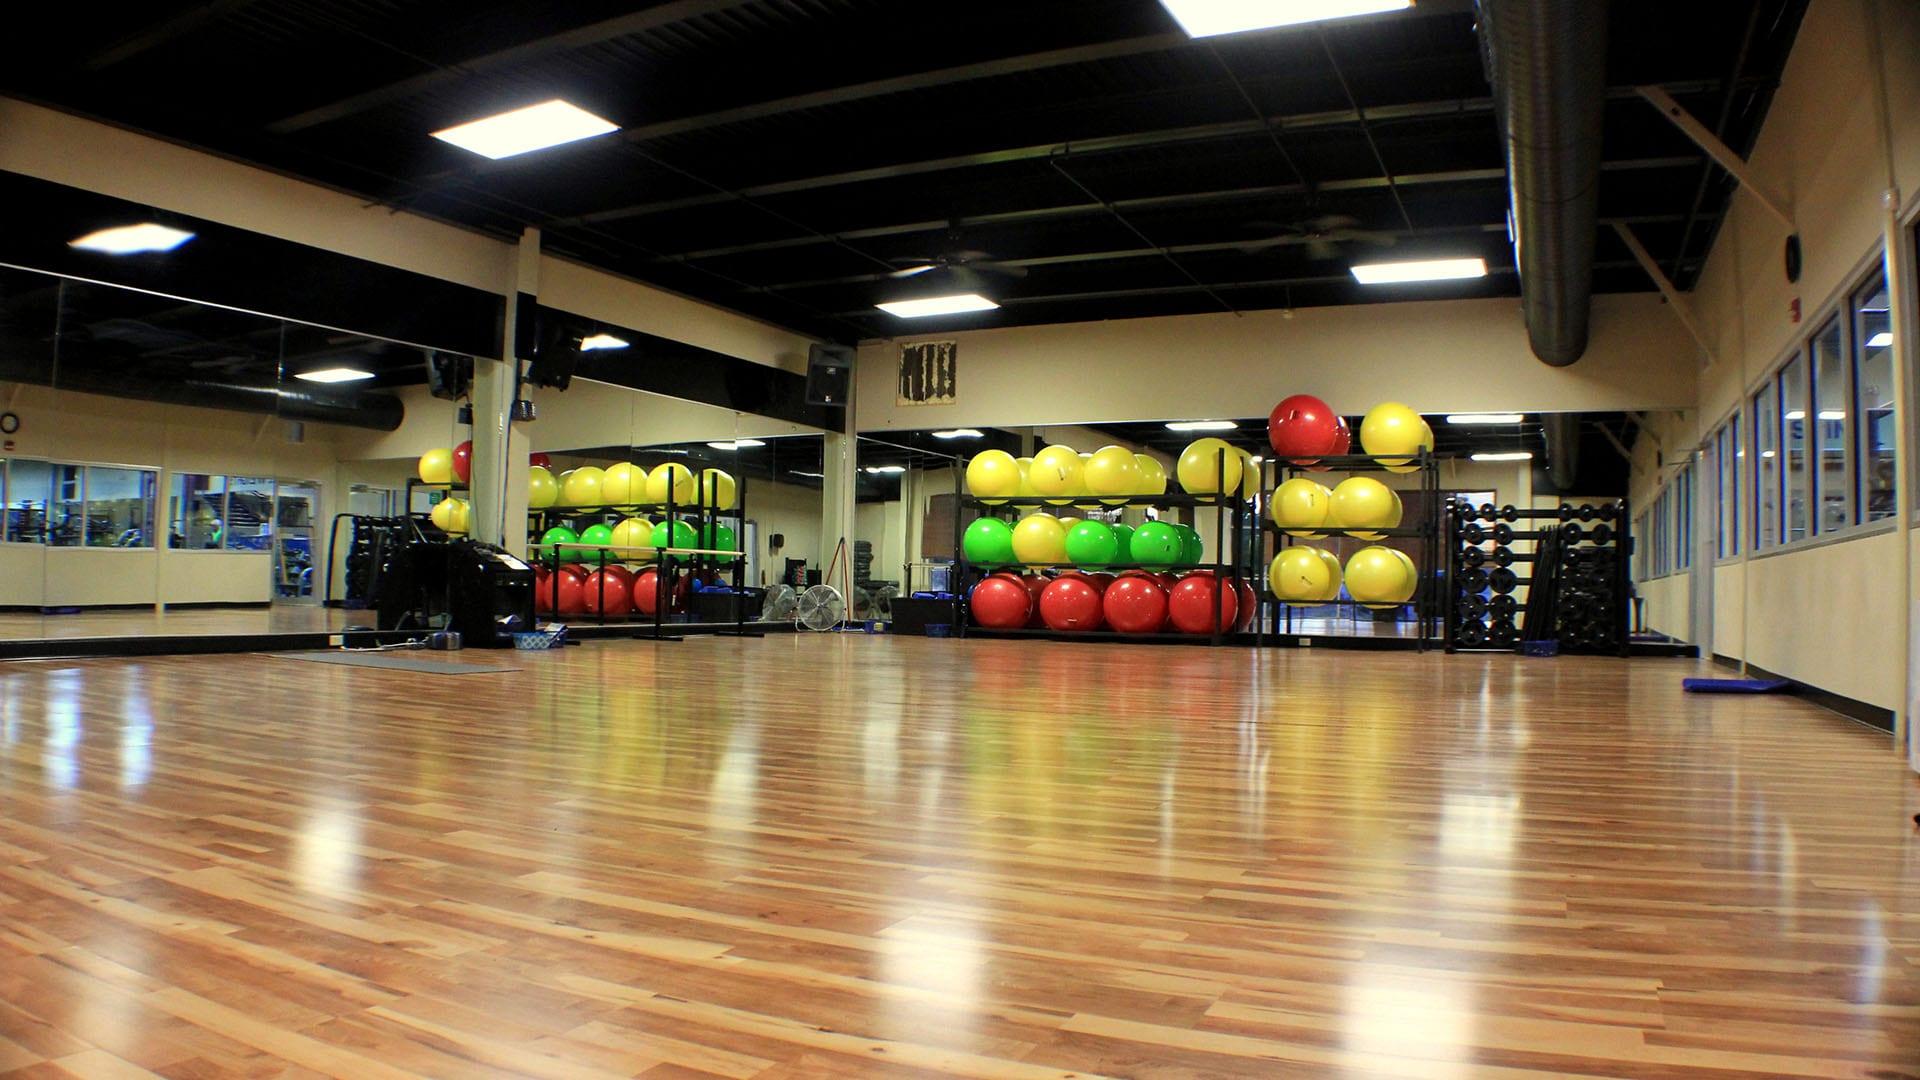 Charter Oak Facility - Dynamic Health & Fitness